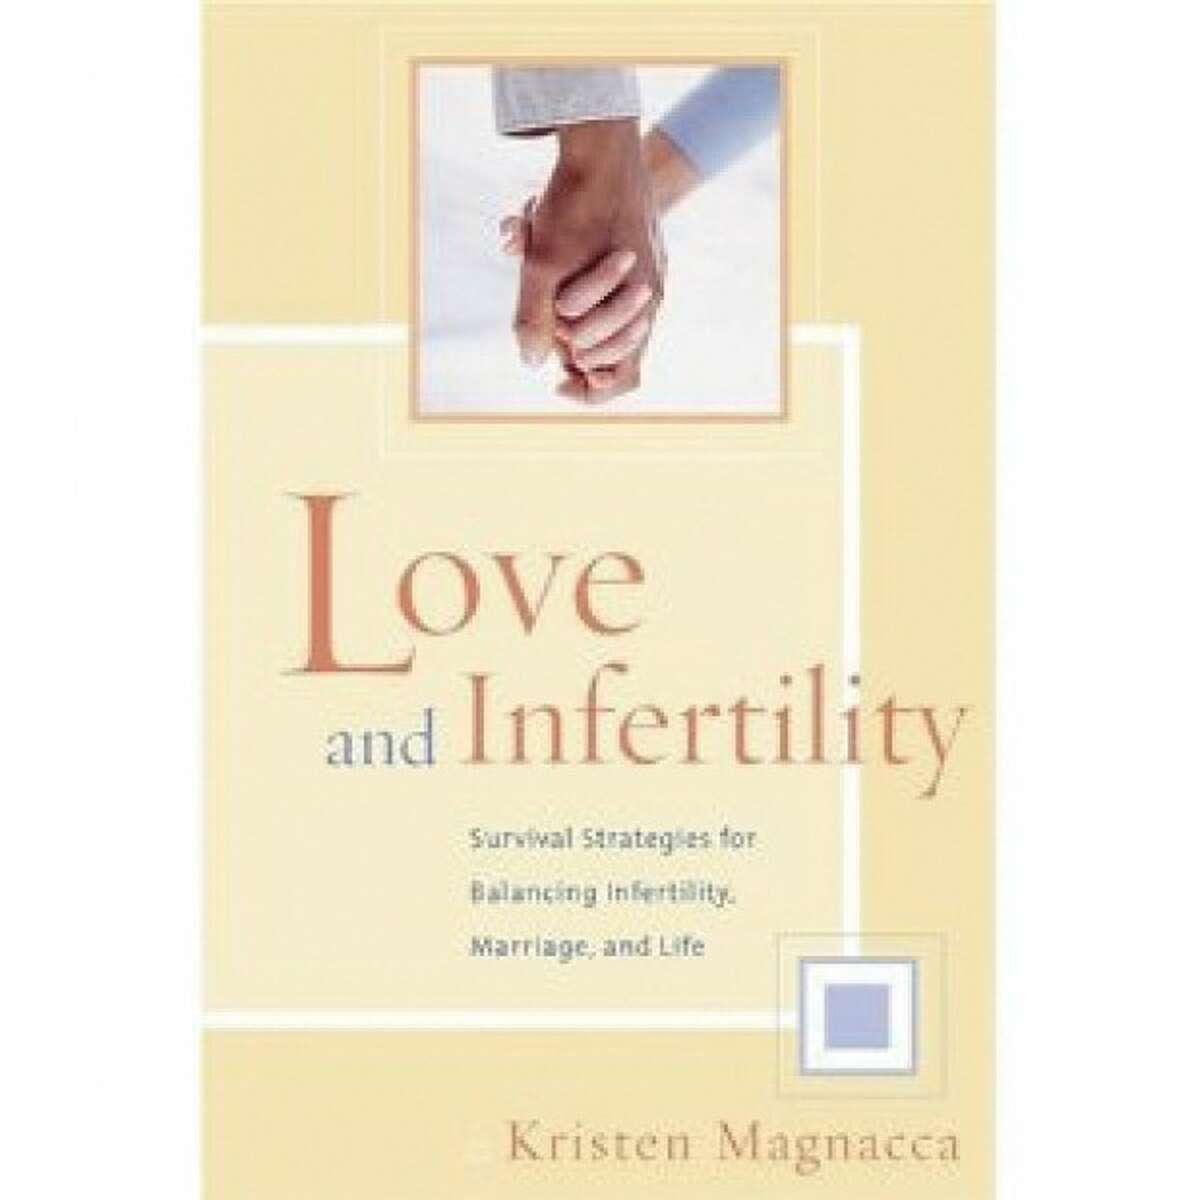 Author addresses emotion trauma of infertility